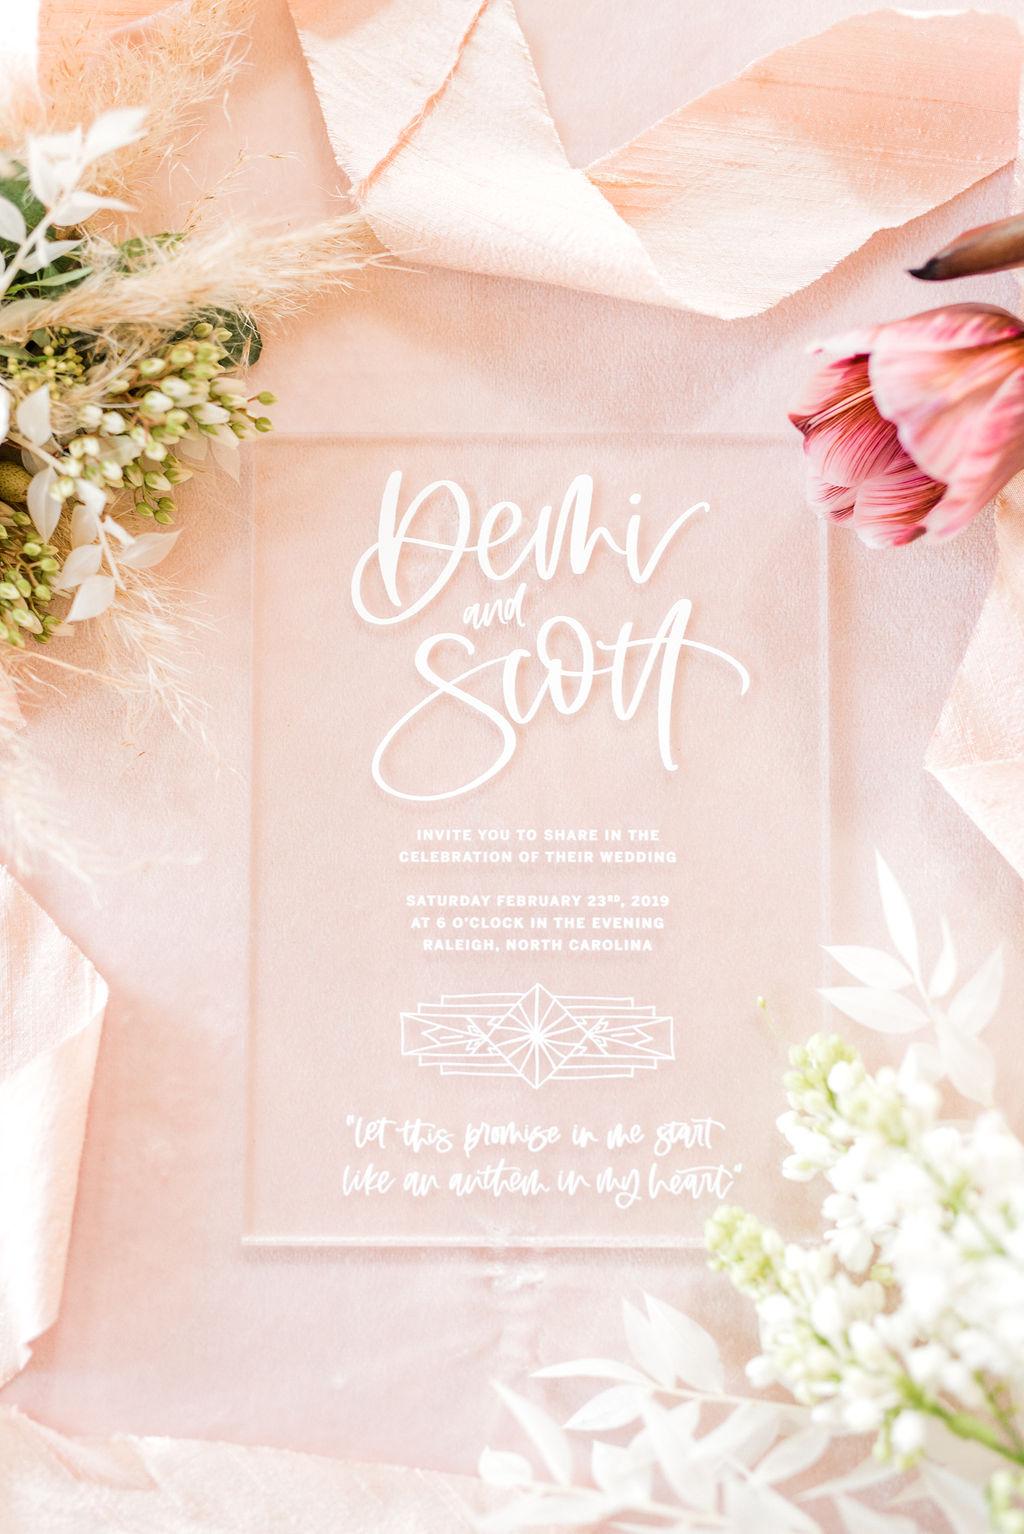 acrylic_wedding_invitation.jpg